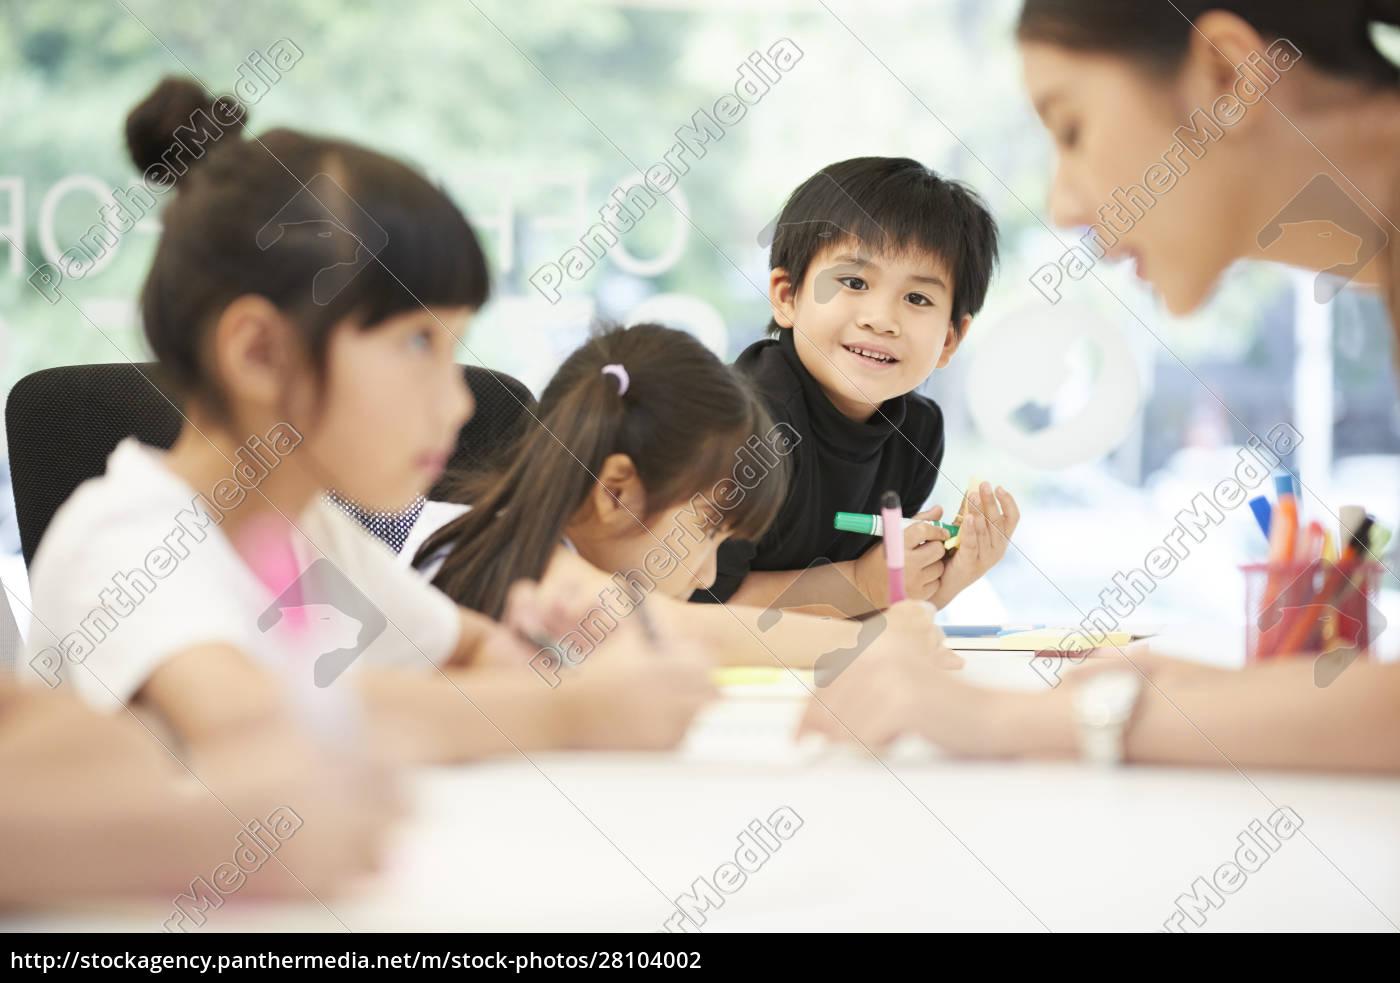 schoolchild, school, life - 28104002